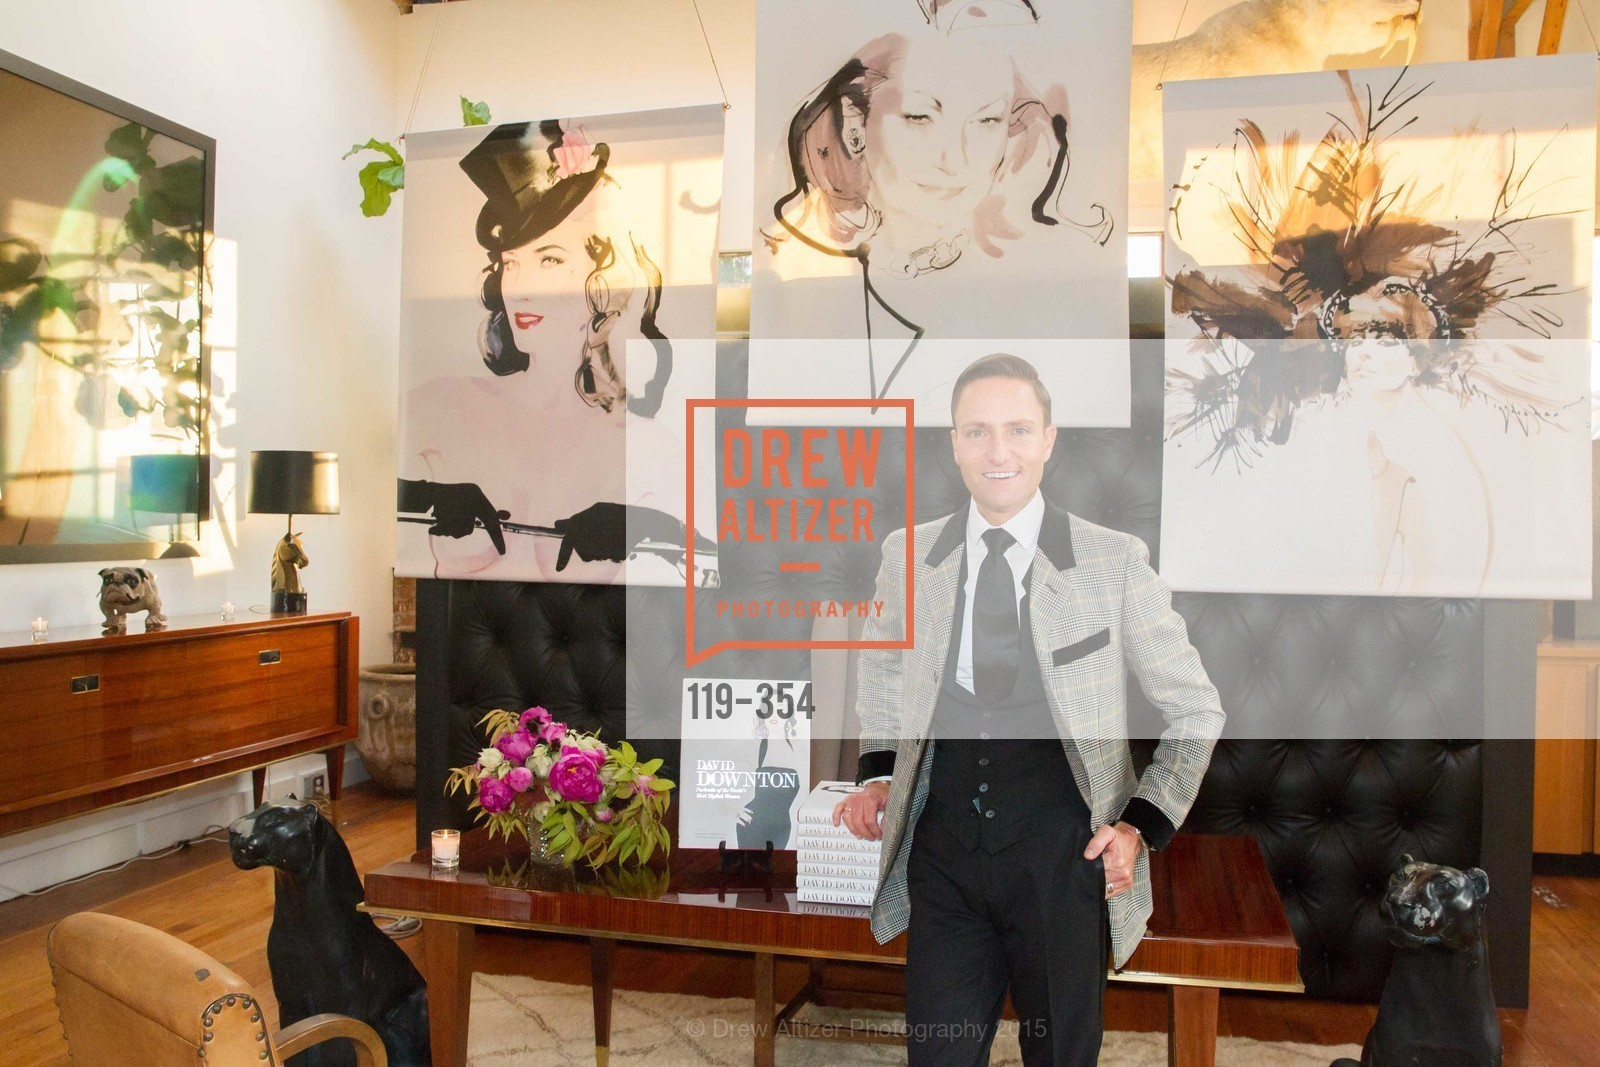 Ken Fulk, Ken Fulk Hosts A David Downton Book Signing Party, Ken Fulk's Loft. 310 7th St, October 9th, 2015,Drew Altizer, Drew Altizer Photography, full-service agency, private events, San Francisco photographer, photographer california